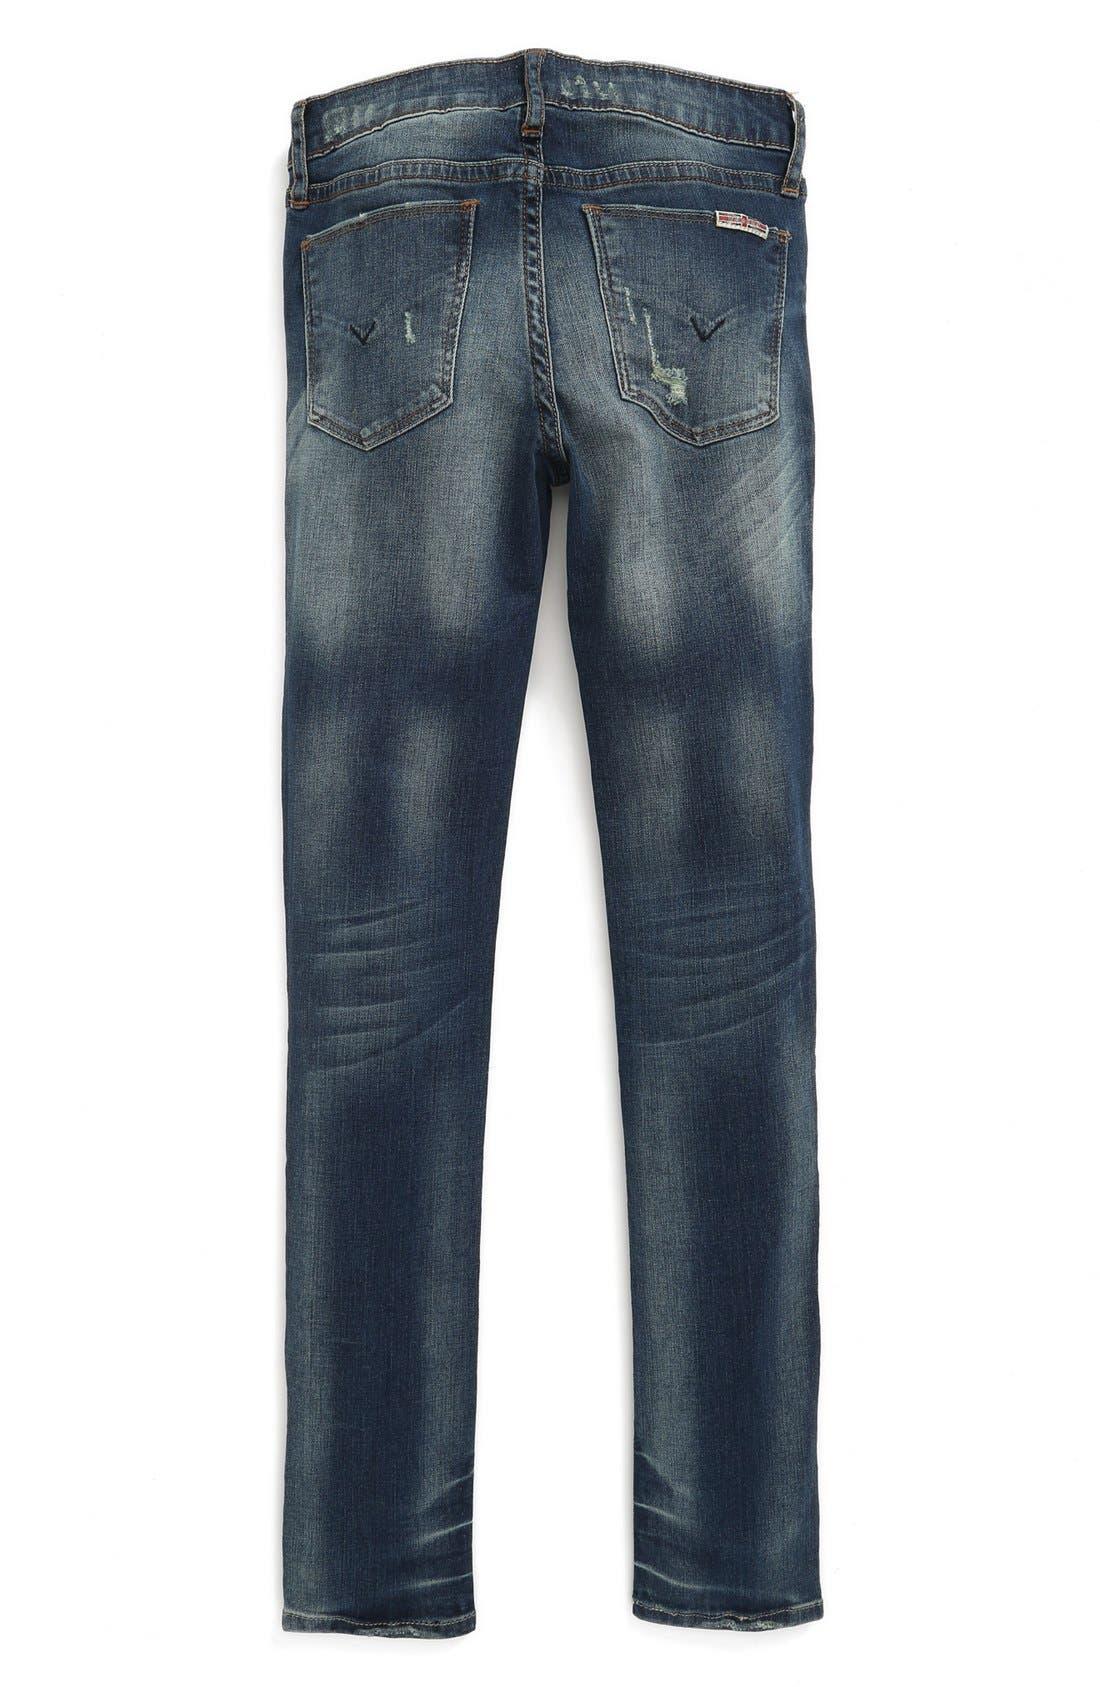 Alternate Image 2  - Hudson Kids 'Dolly' Skinny Jeans (Big Girls)